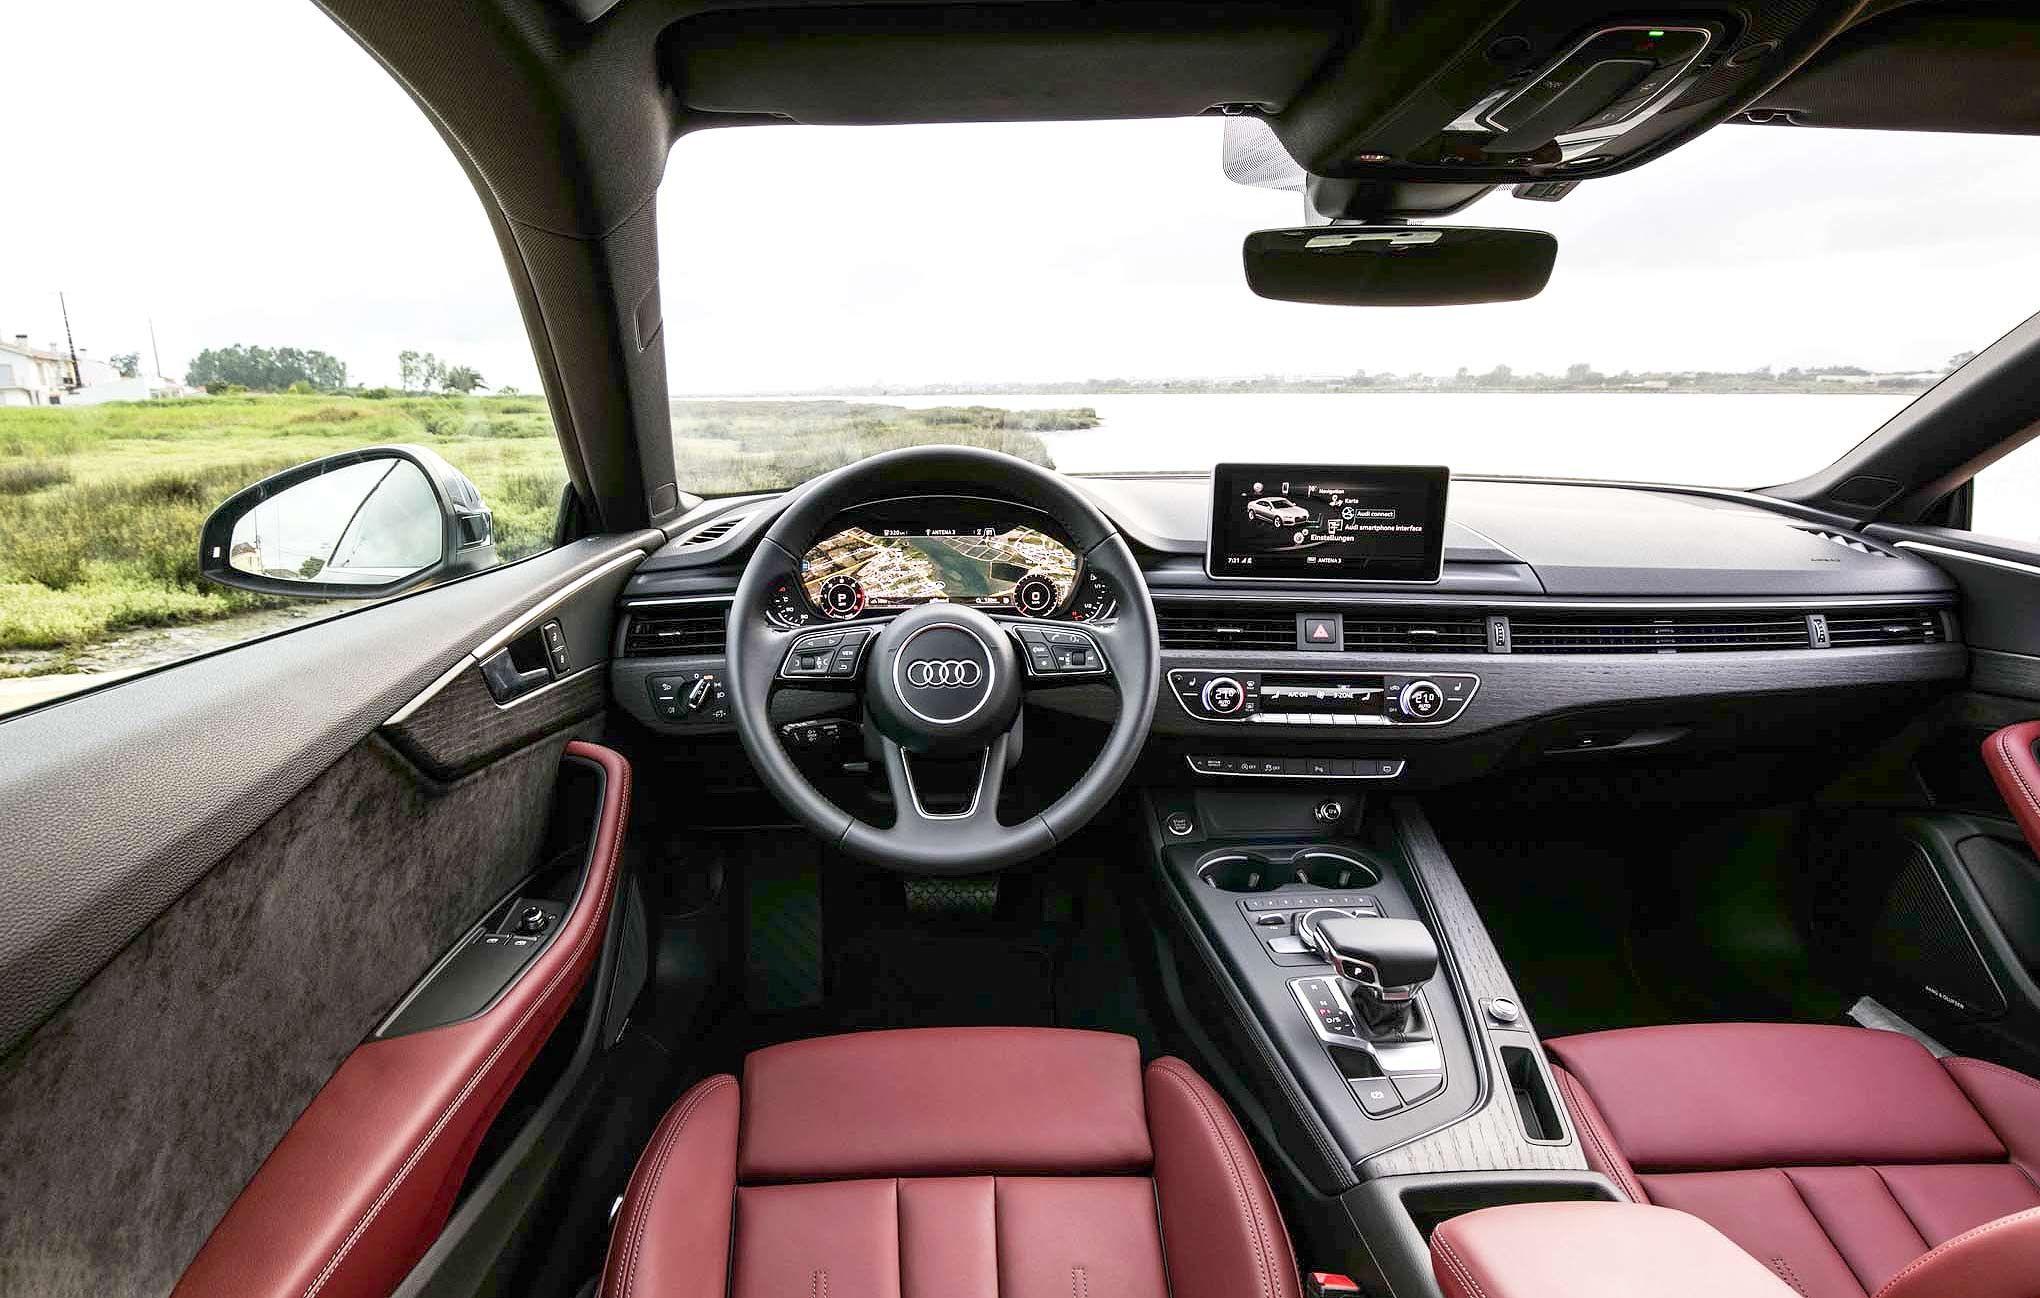 2019 Audi S5 Features Interior And Exterior Audi A5 Audi A5 Convertible Audi S5 Sportback